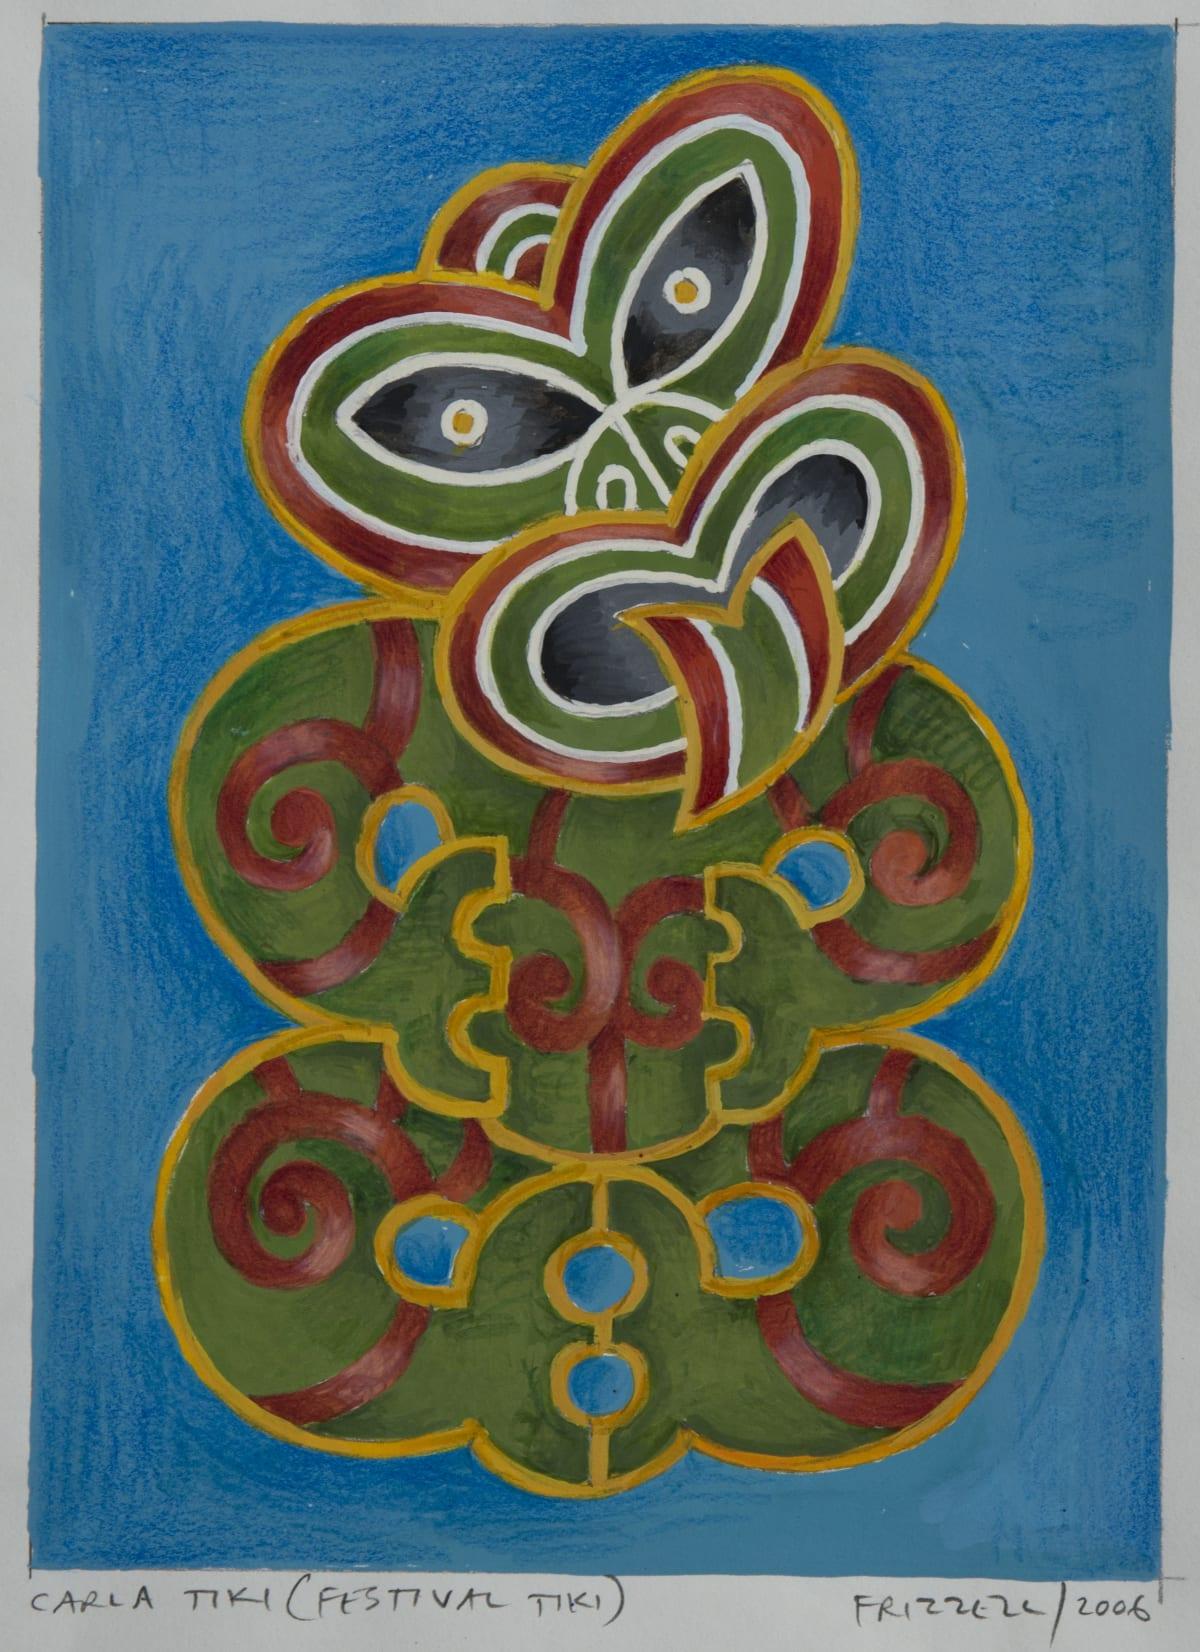 Dick FRIZZELL Carla Tiki (Festival Tiki), 2006 Gouache and pencil on paper 7.8 x 5.5 in 19.7 x 14 cm 47.5 x 37.5cm (framed)